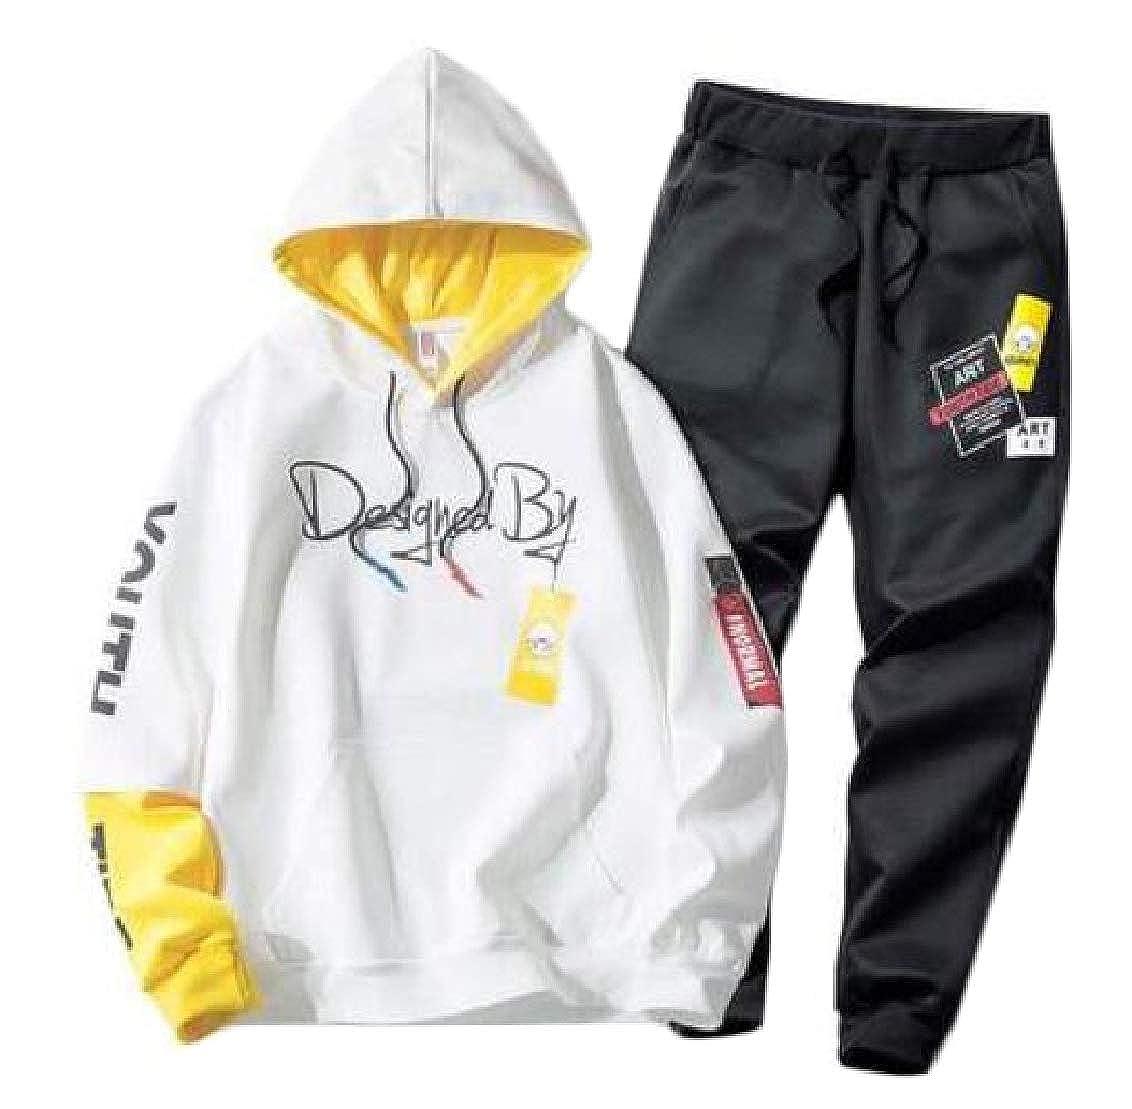 FieerMen Hood Hip Hop Flower Print Leisure Oversize Sweatshirt Pants Set